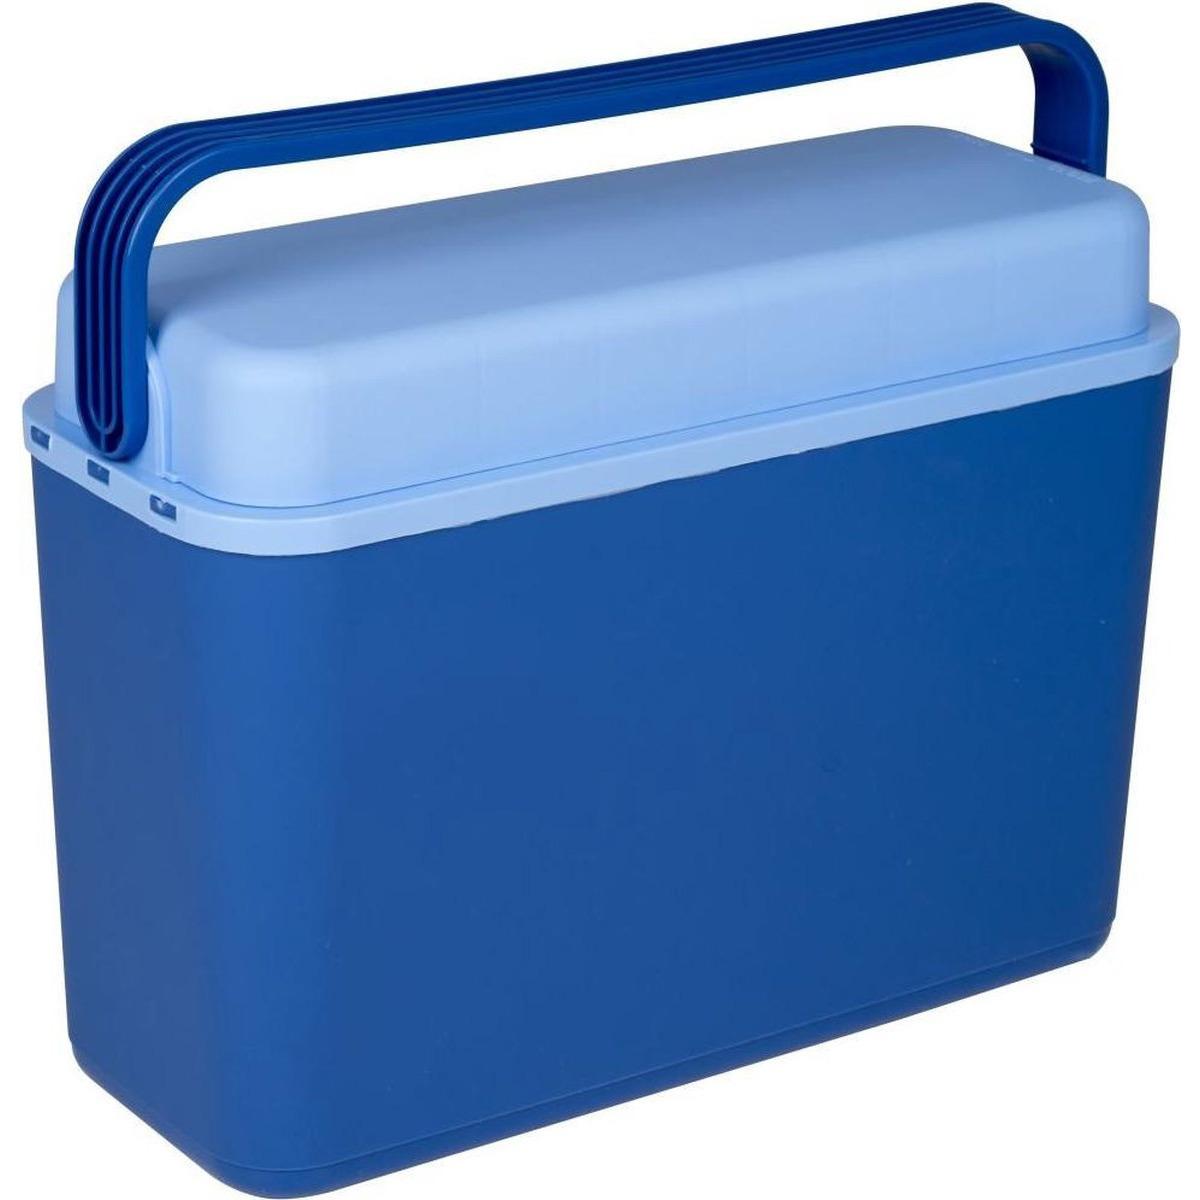 Koelbox donkerblauw 12 liter 40 x 17 x 29 cm